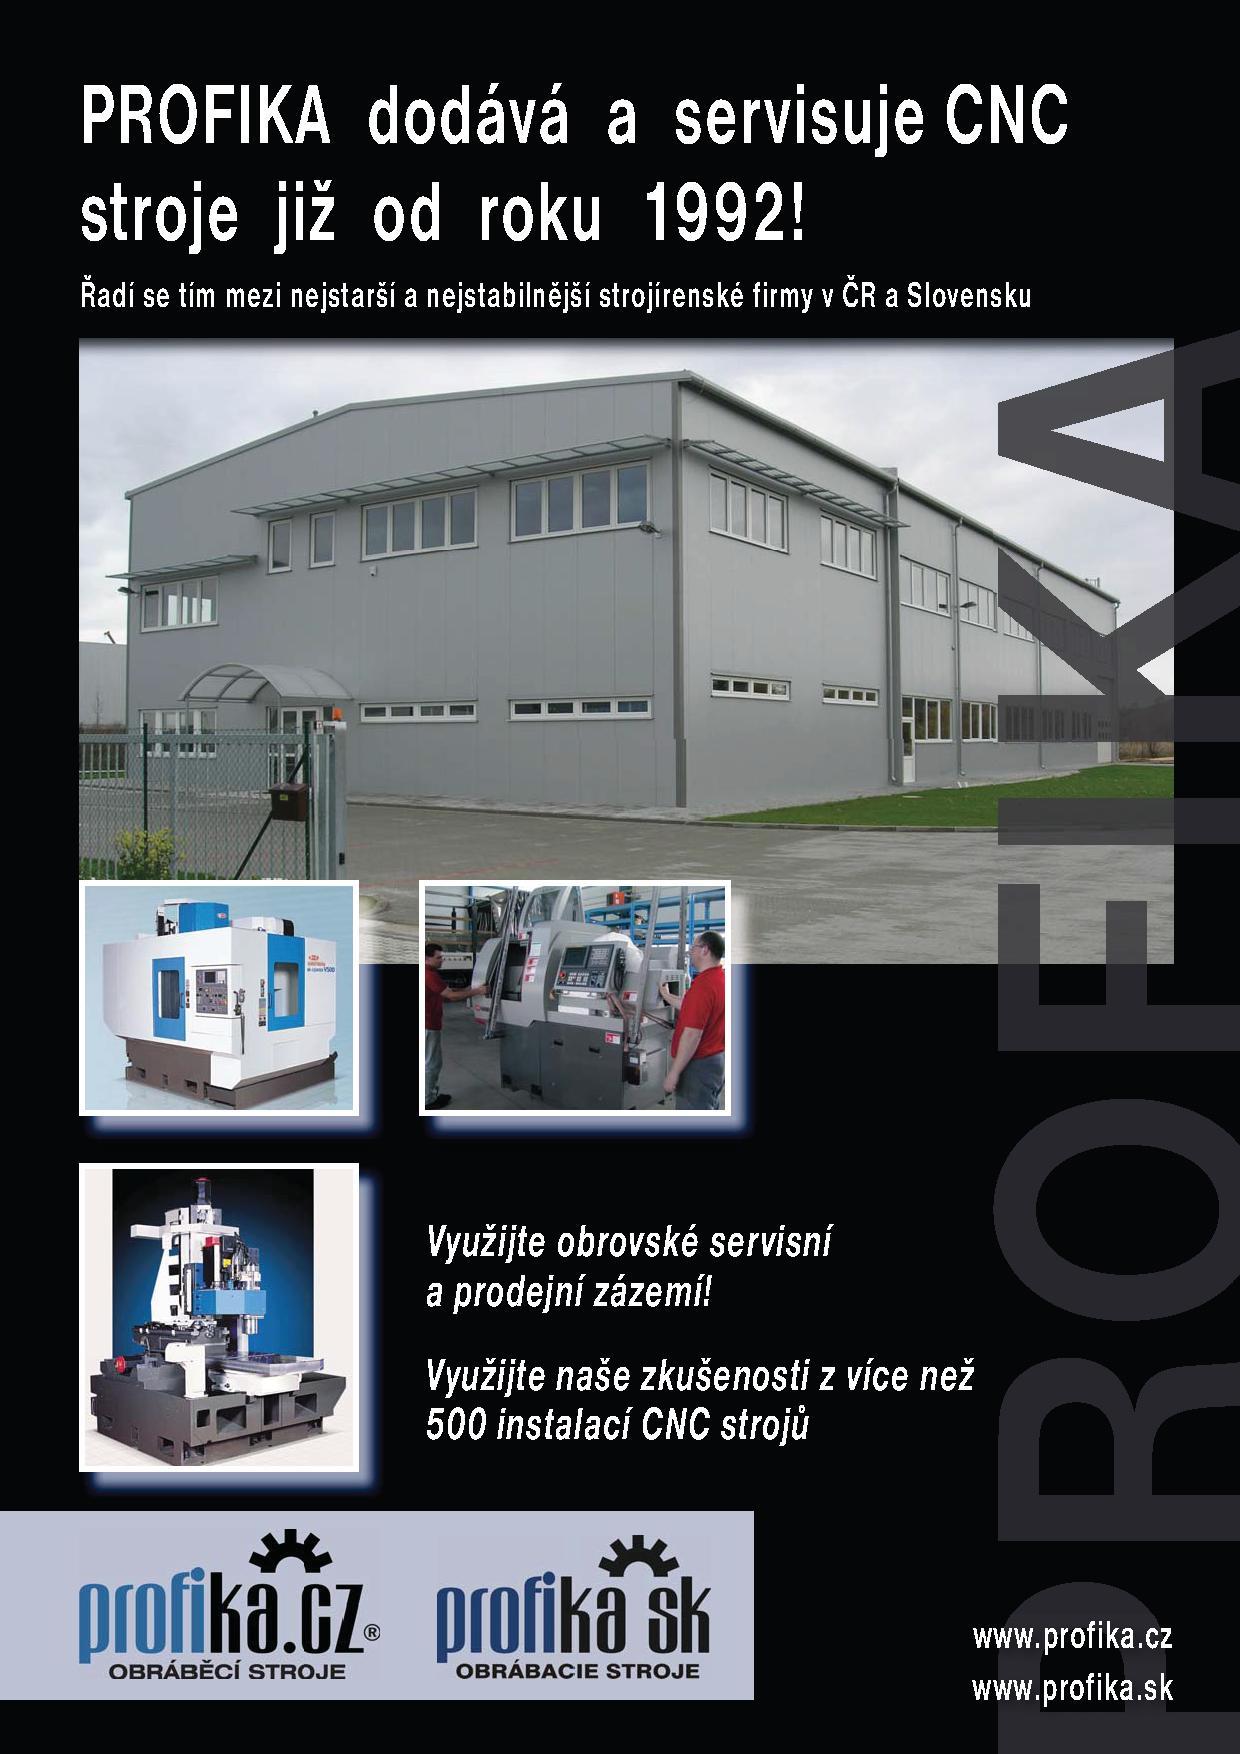 ai-profika-cover-zadok